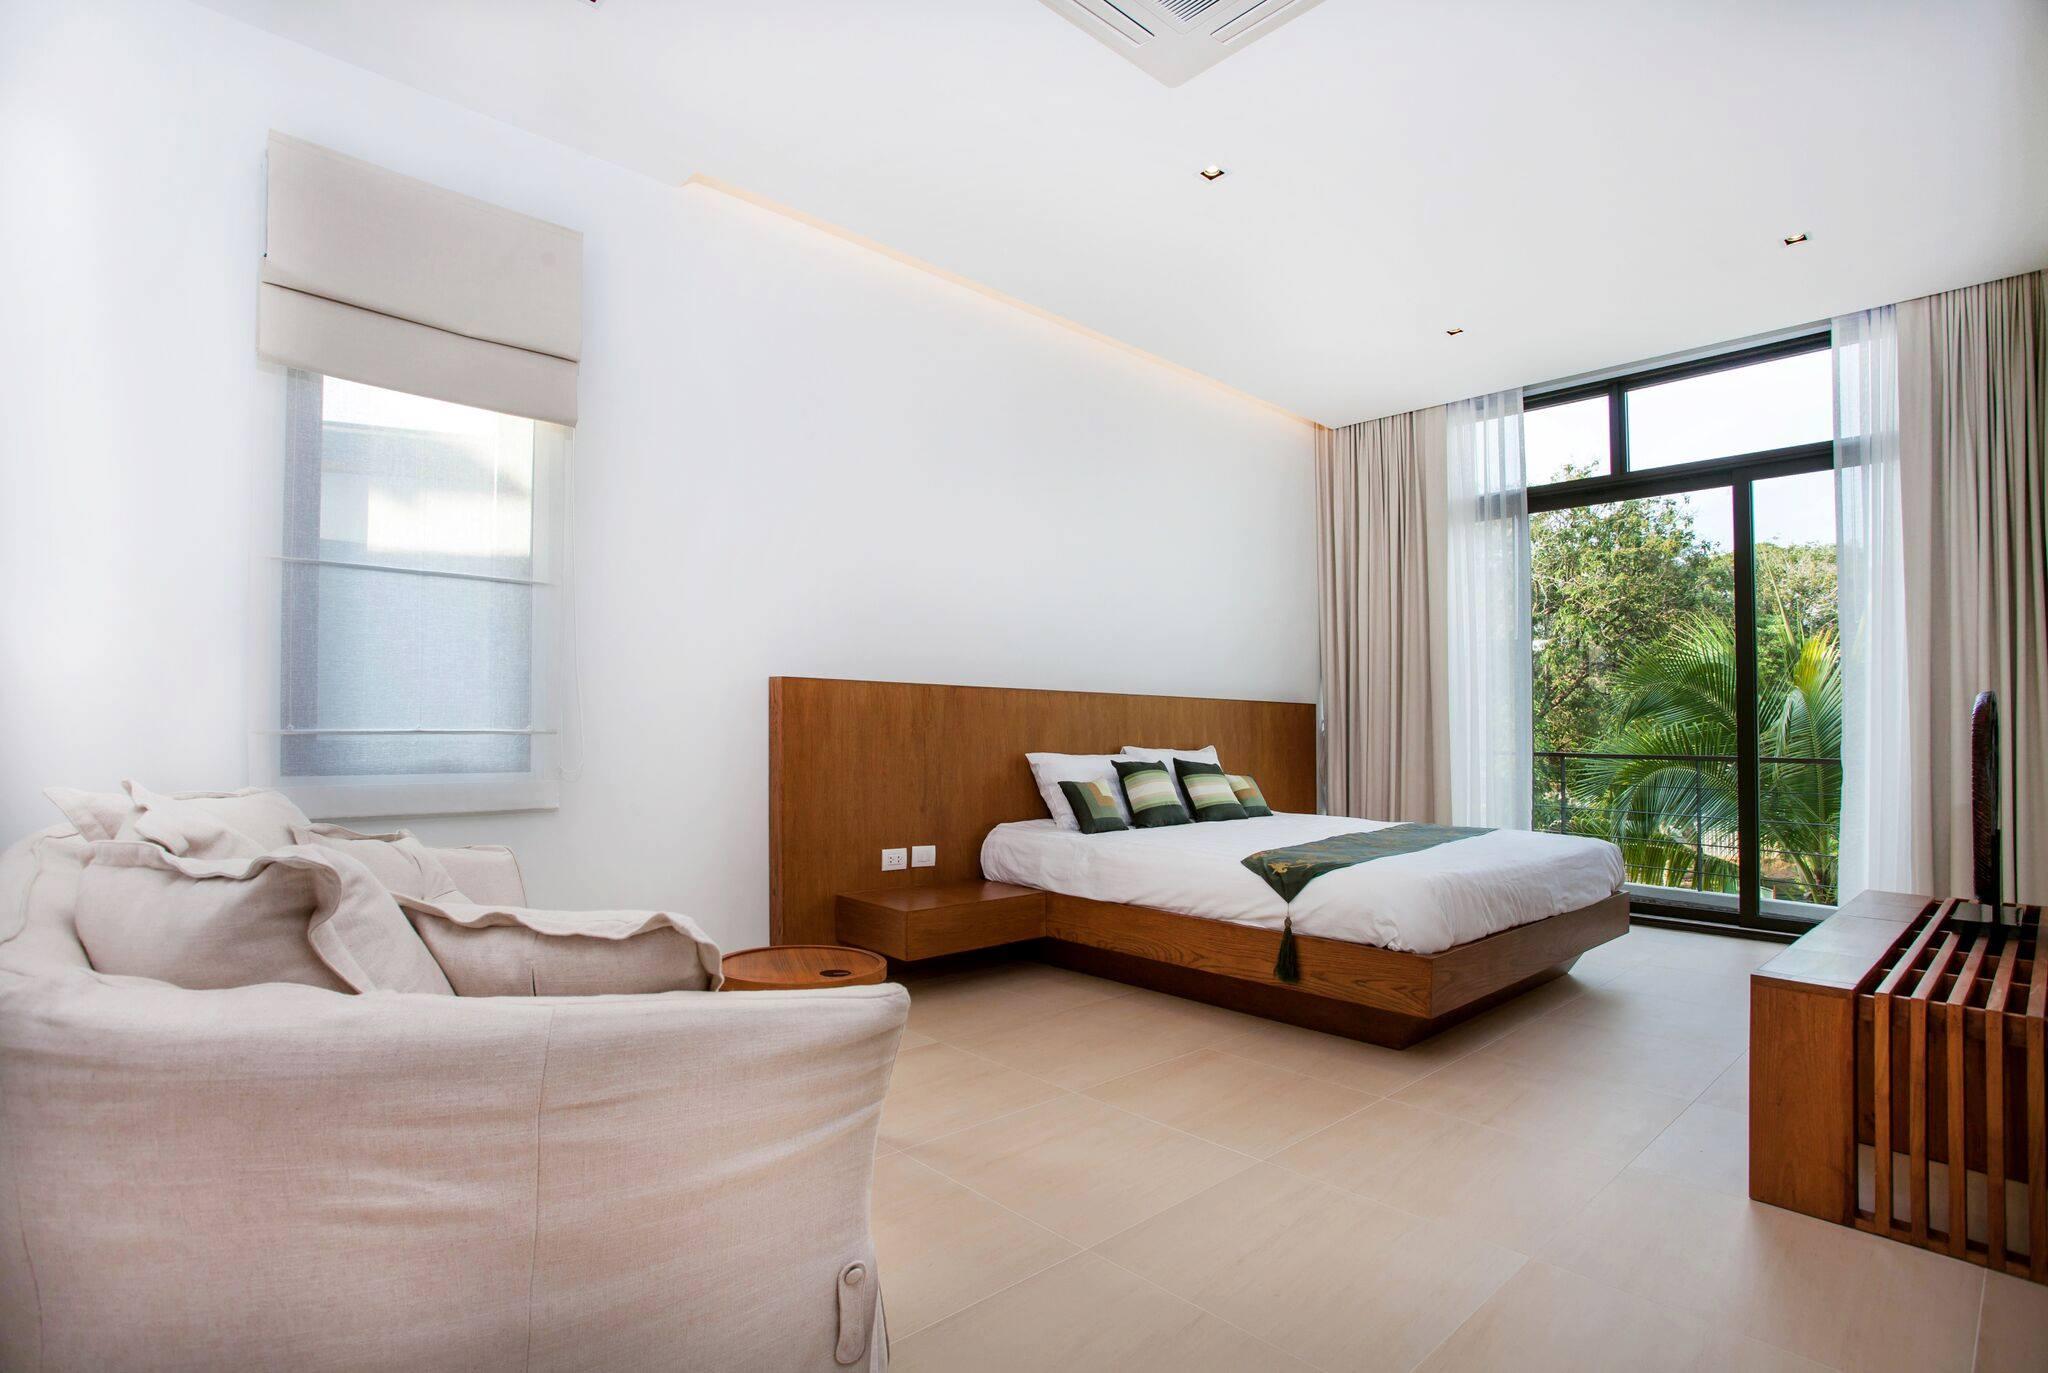 Phuket Real Estate Agency – Nai Harn Beach (44)